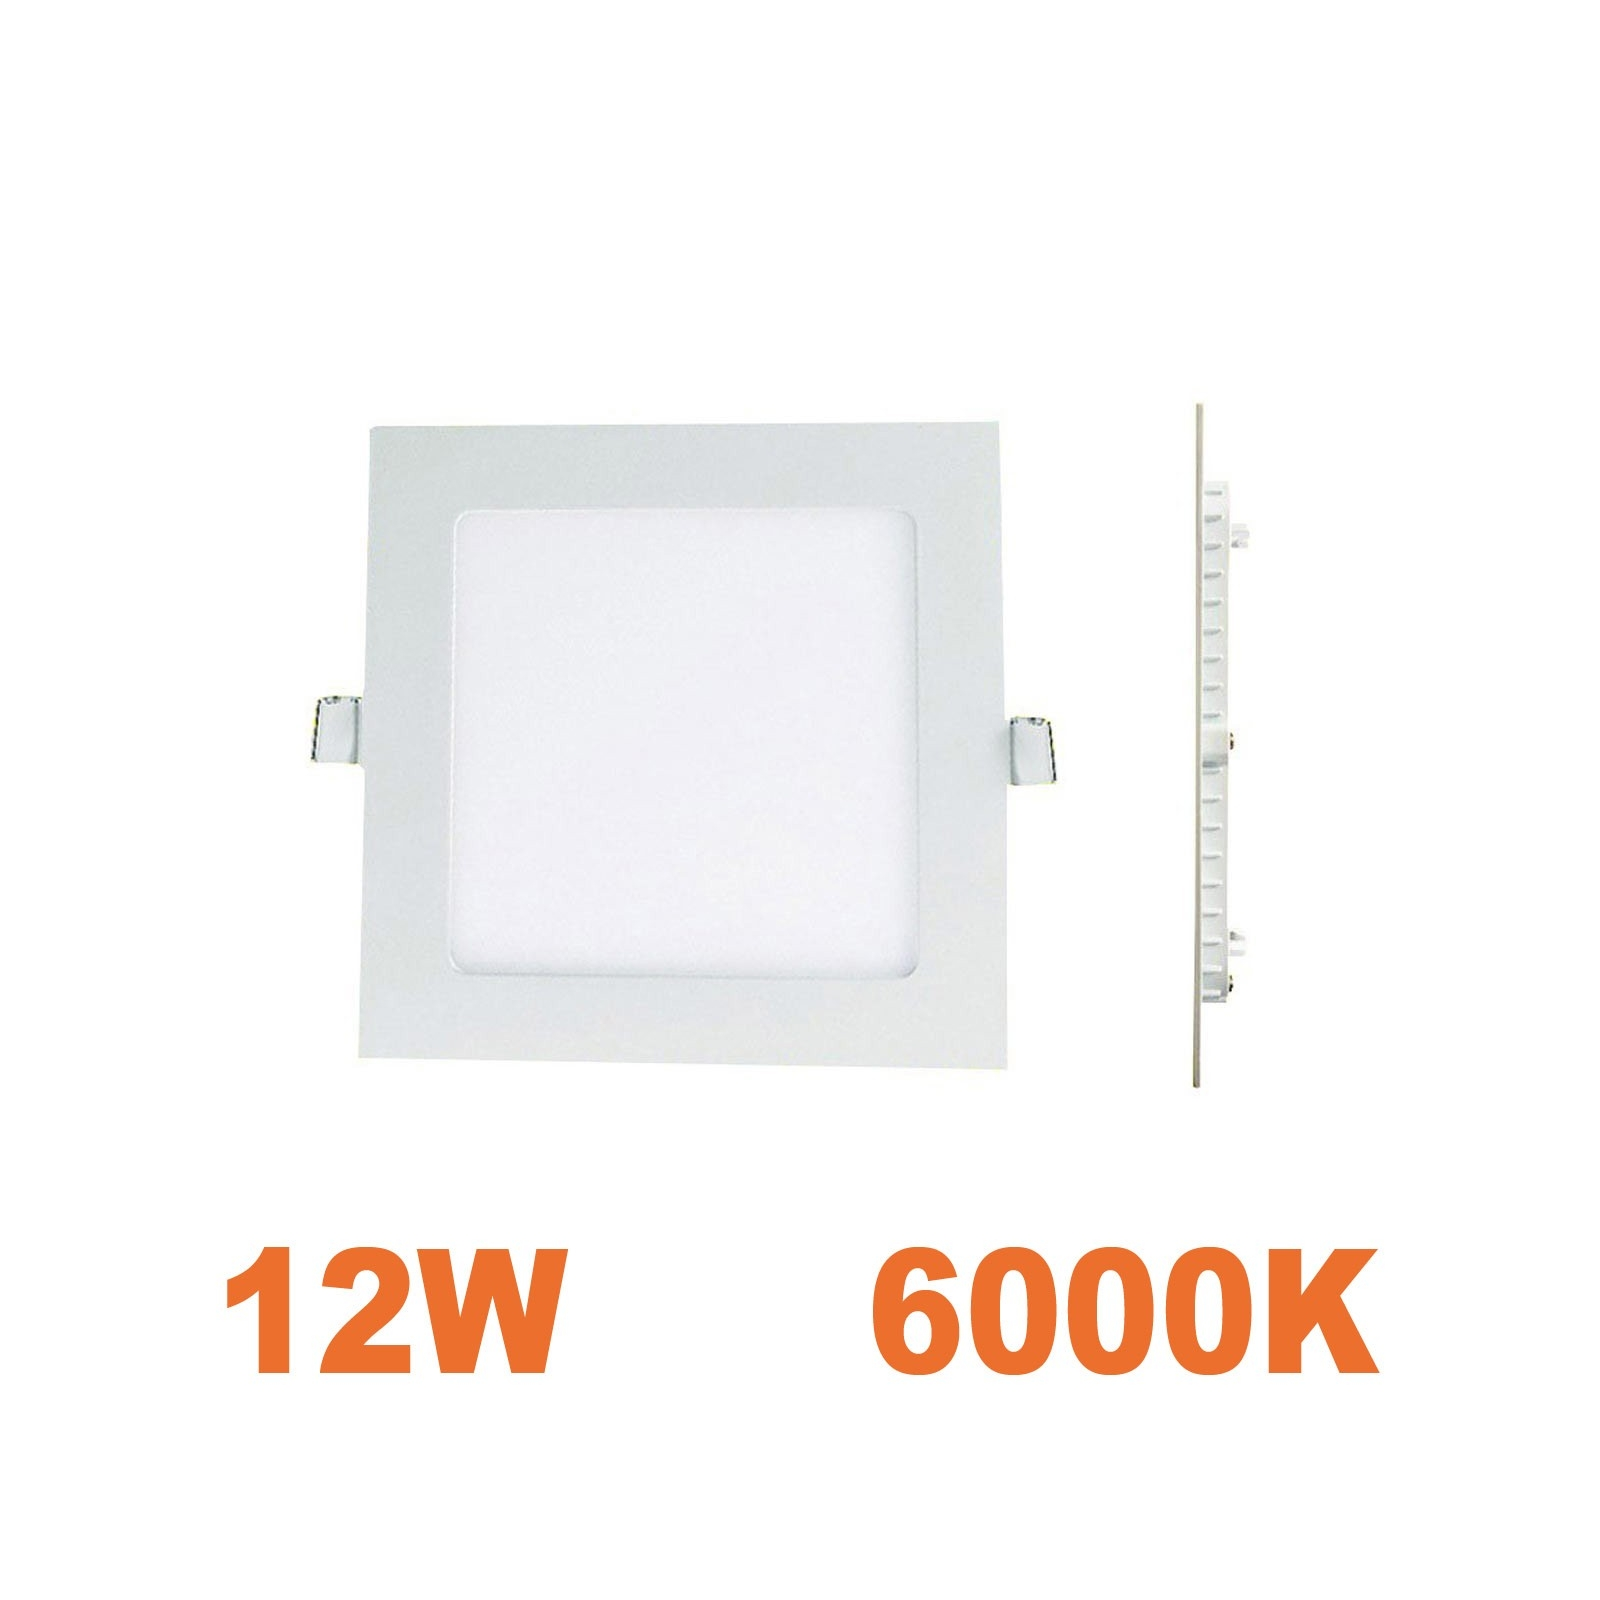 spot encastrable led carre downlight panel extra plat 12w blanc froid 6000k